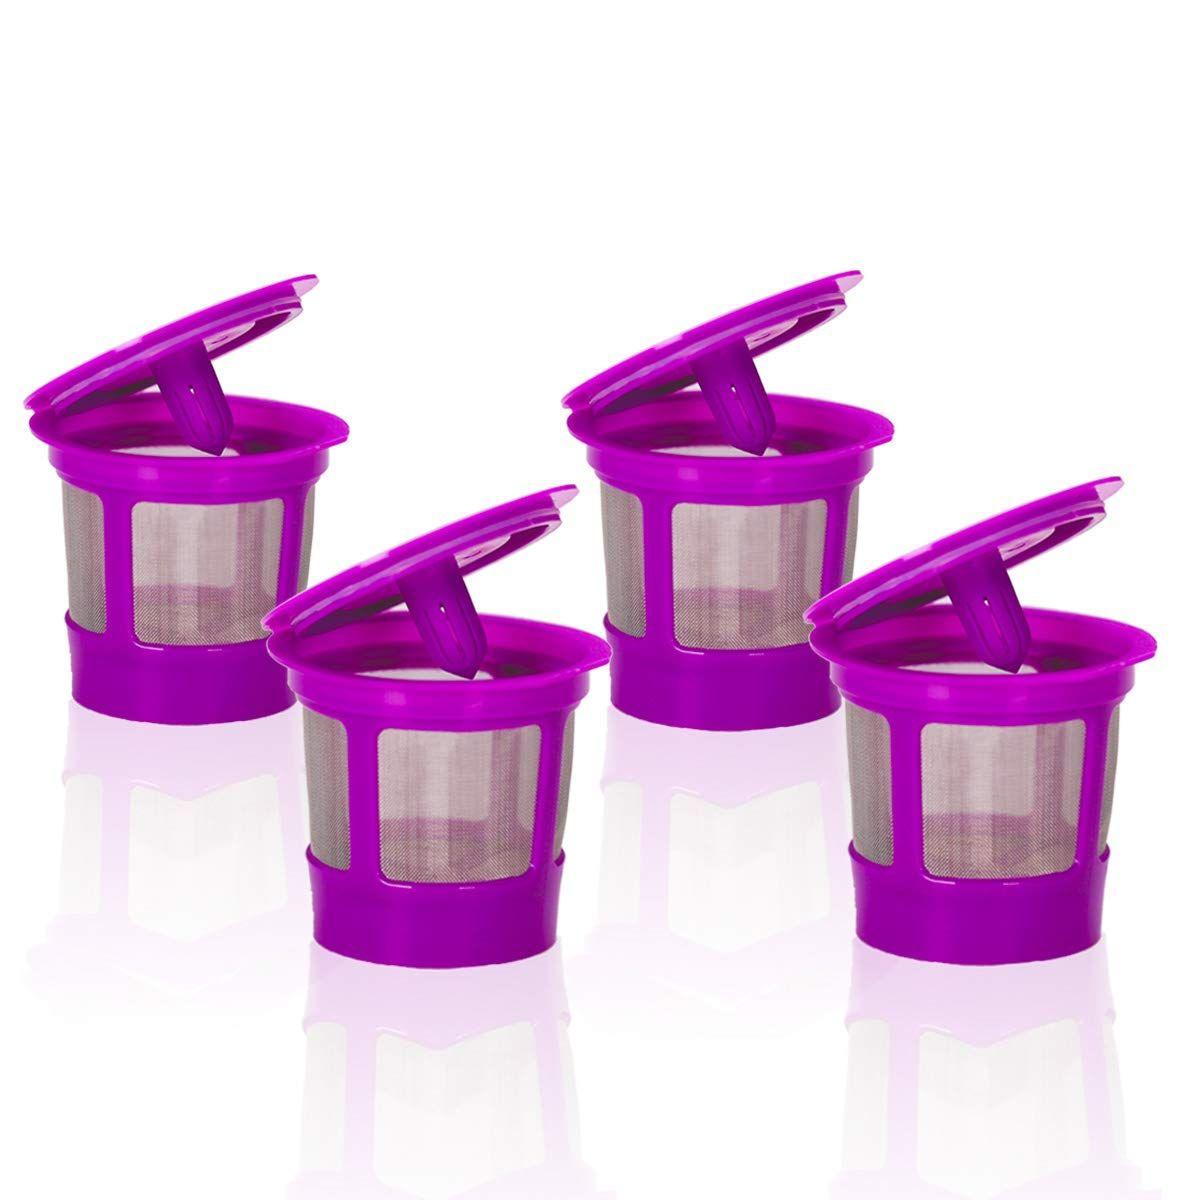 4 Pack Keurig Coffee Filter Reusable K Cups Replacement